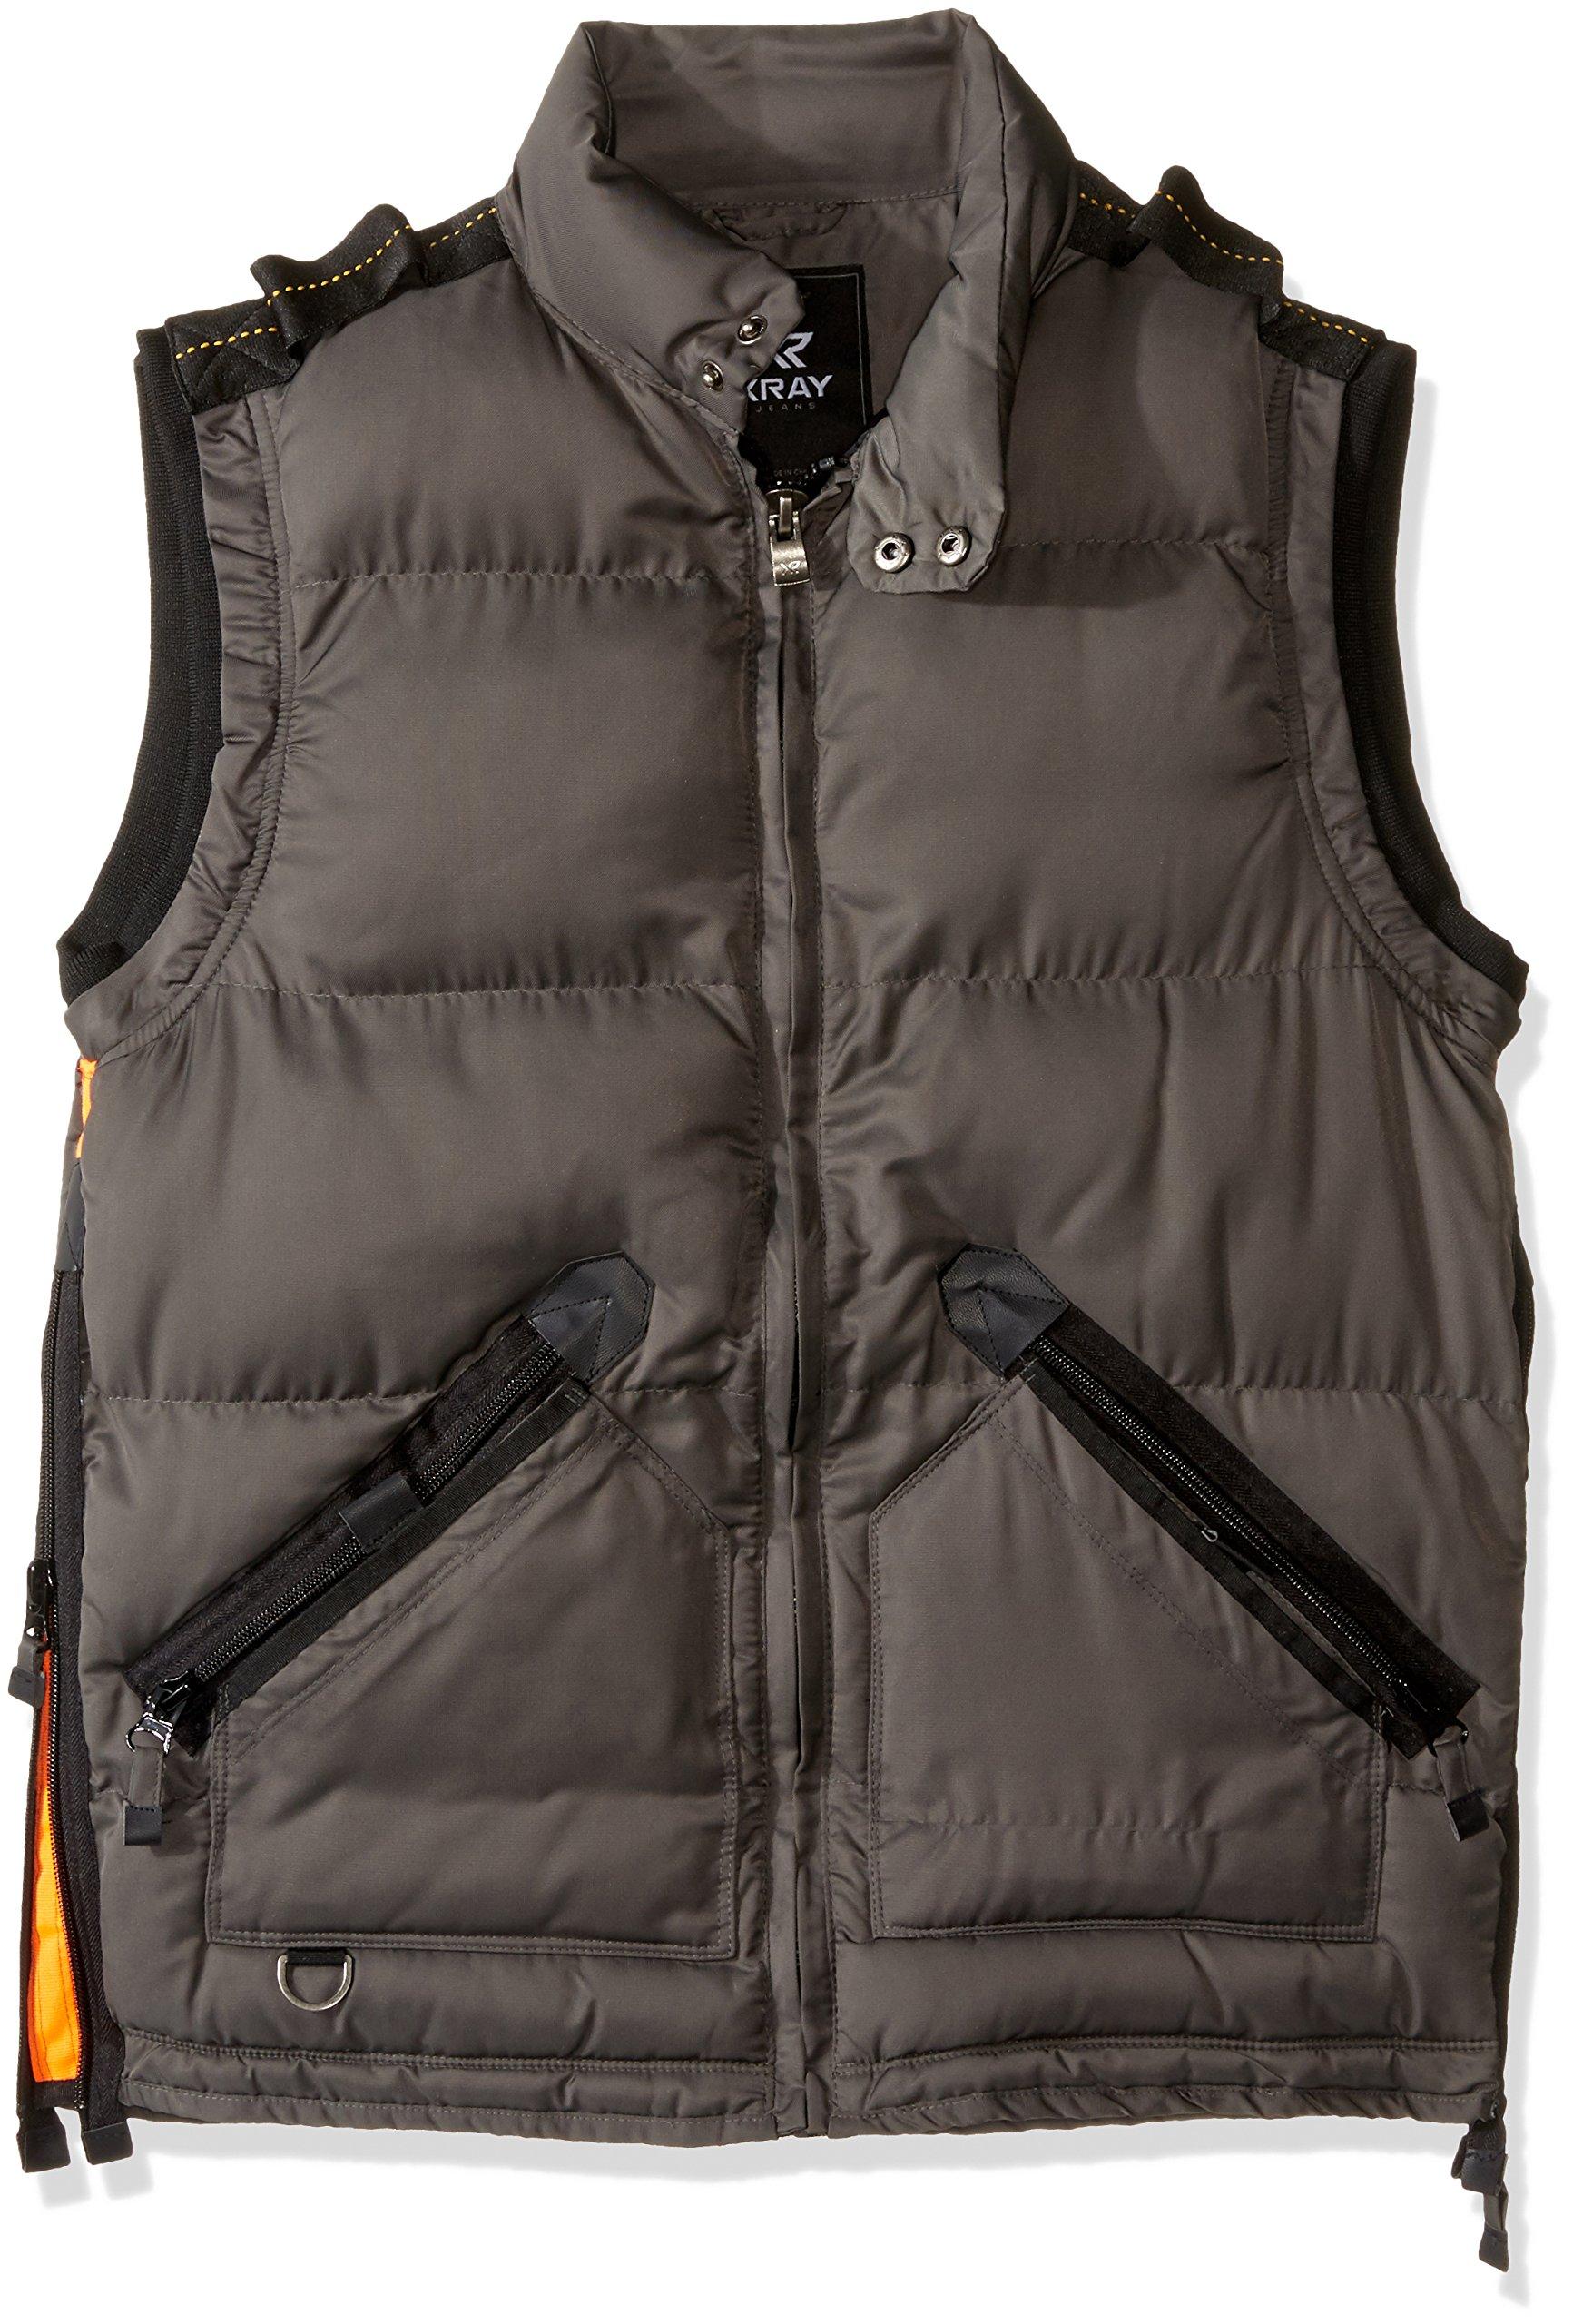 X-Ray Men's Slim Fit Puffer Vest, Charcoal, XL